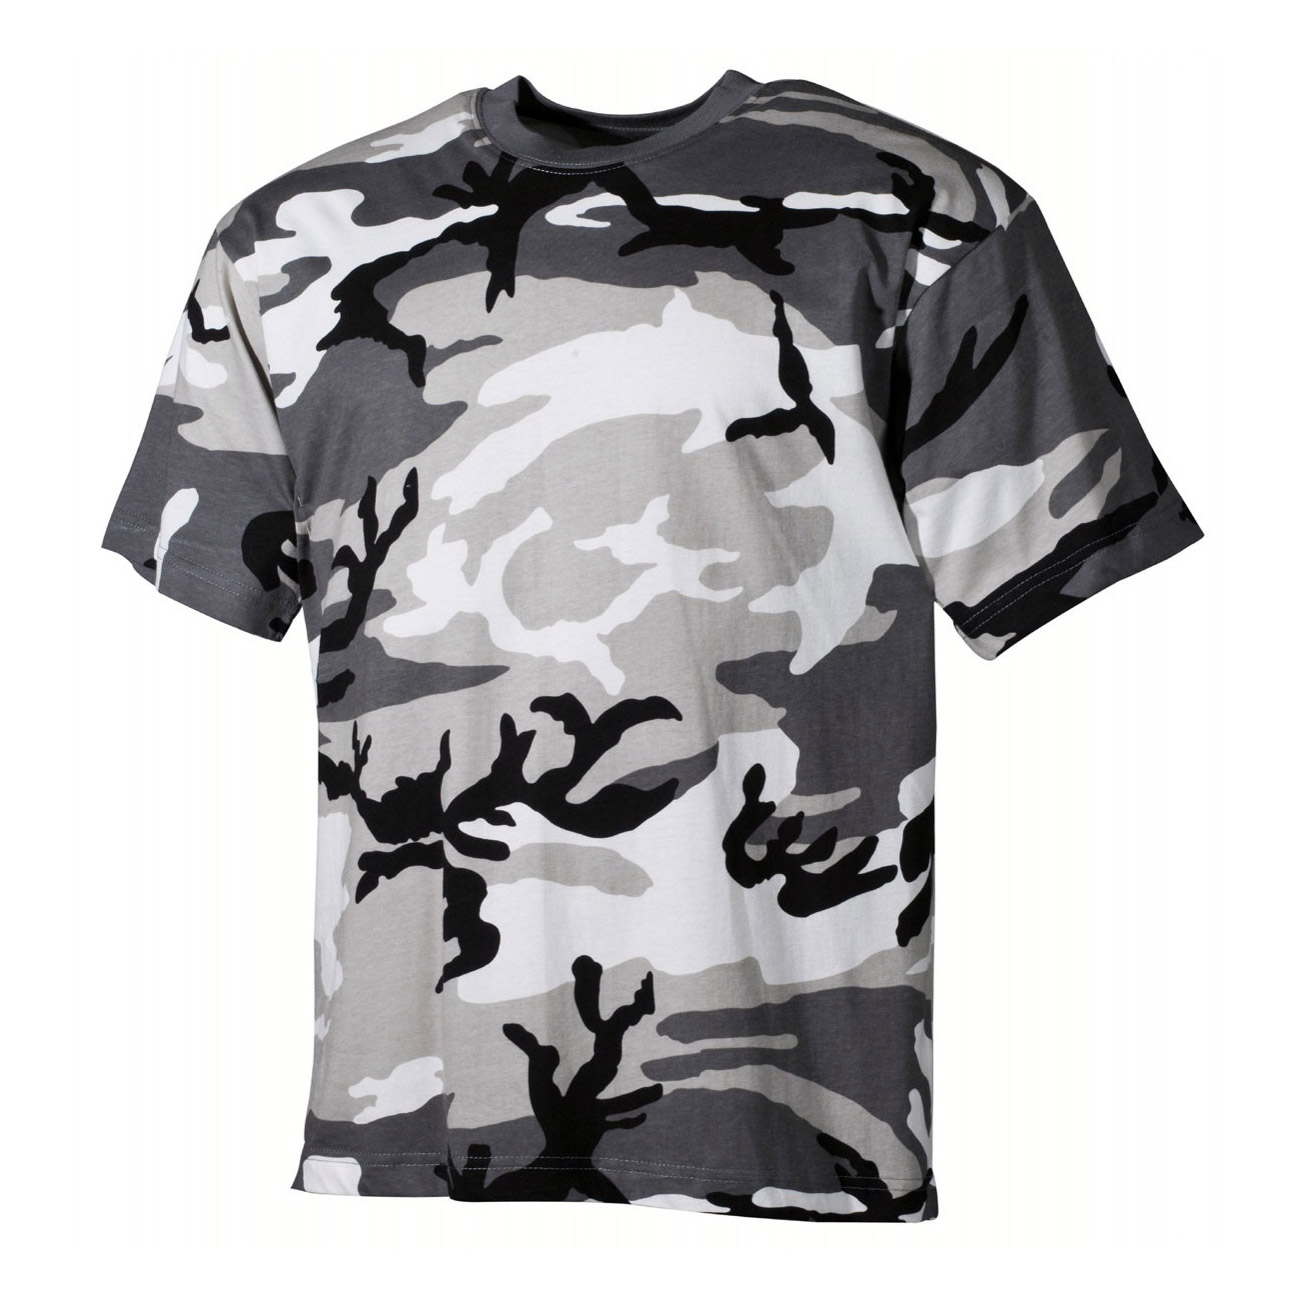 ac4b80956b6485 MFH US T-Shirt Streetstyle urban günstig kaufen - Kotte & Zeller